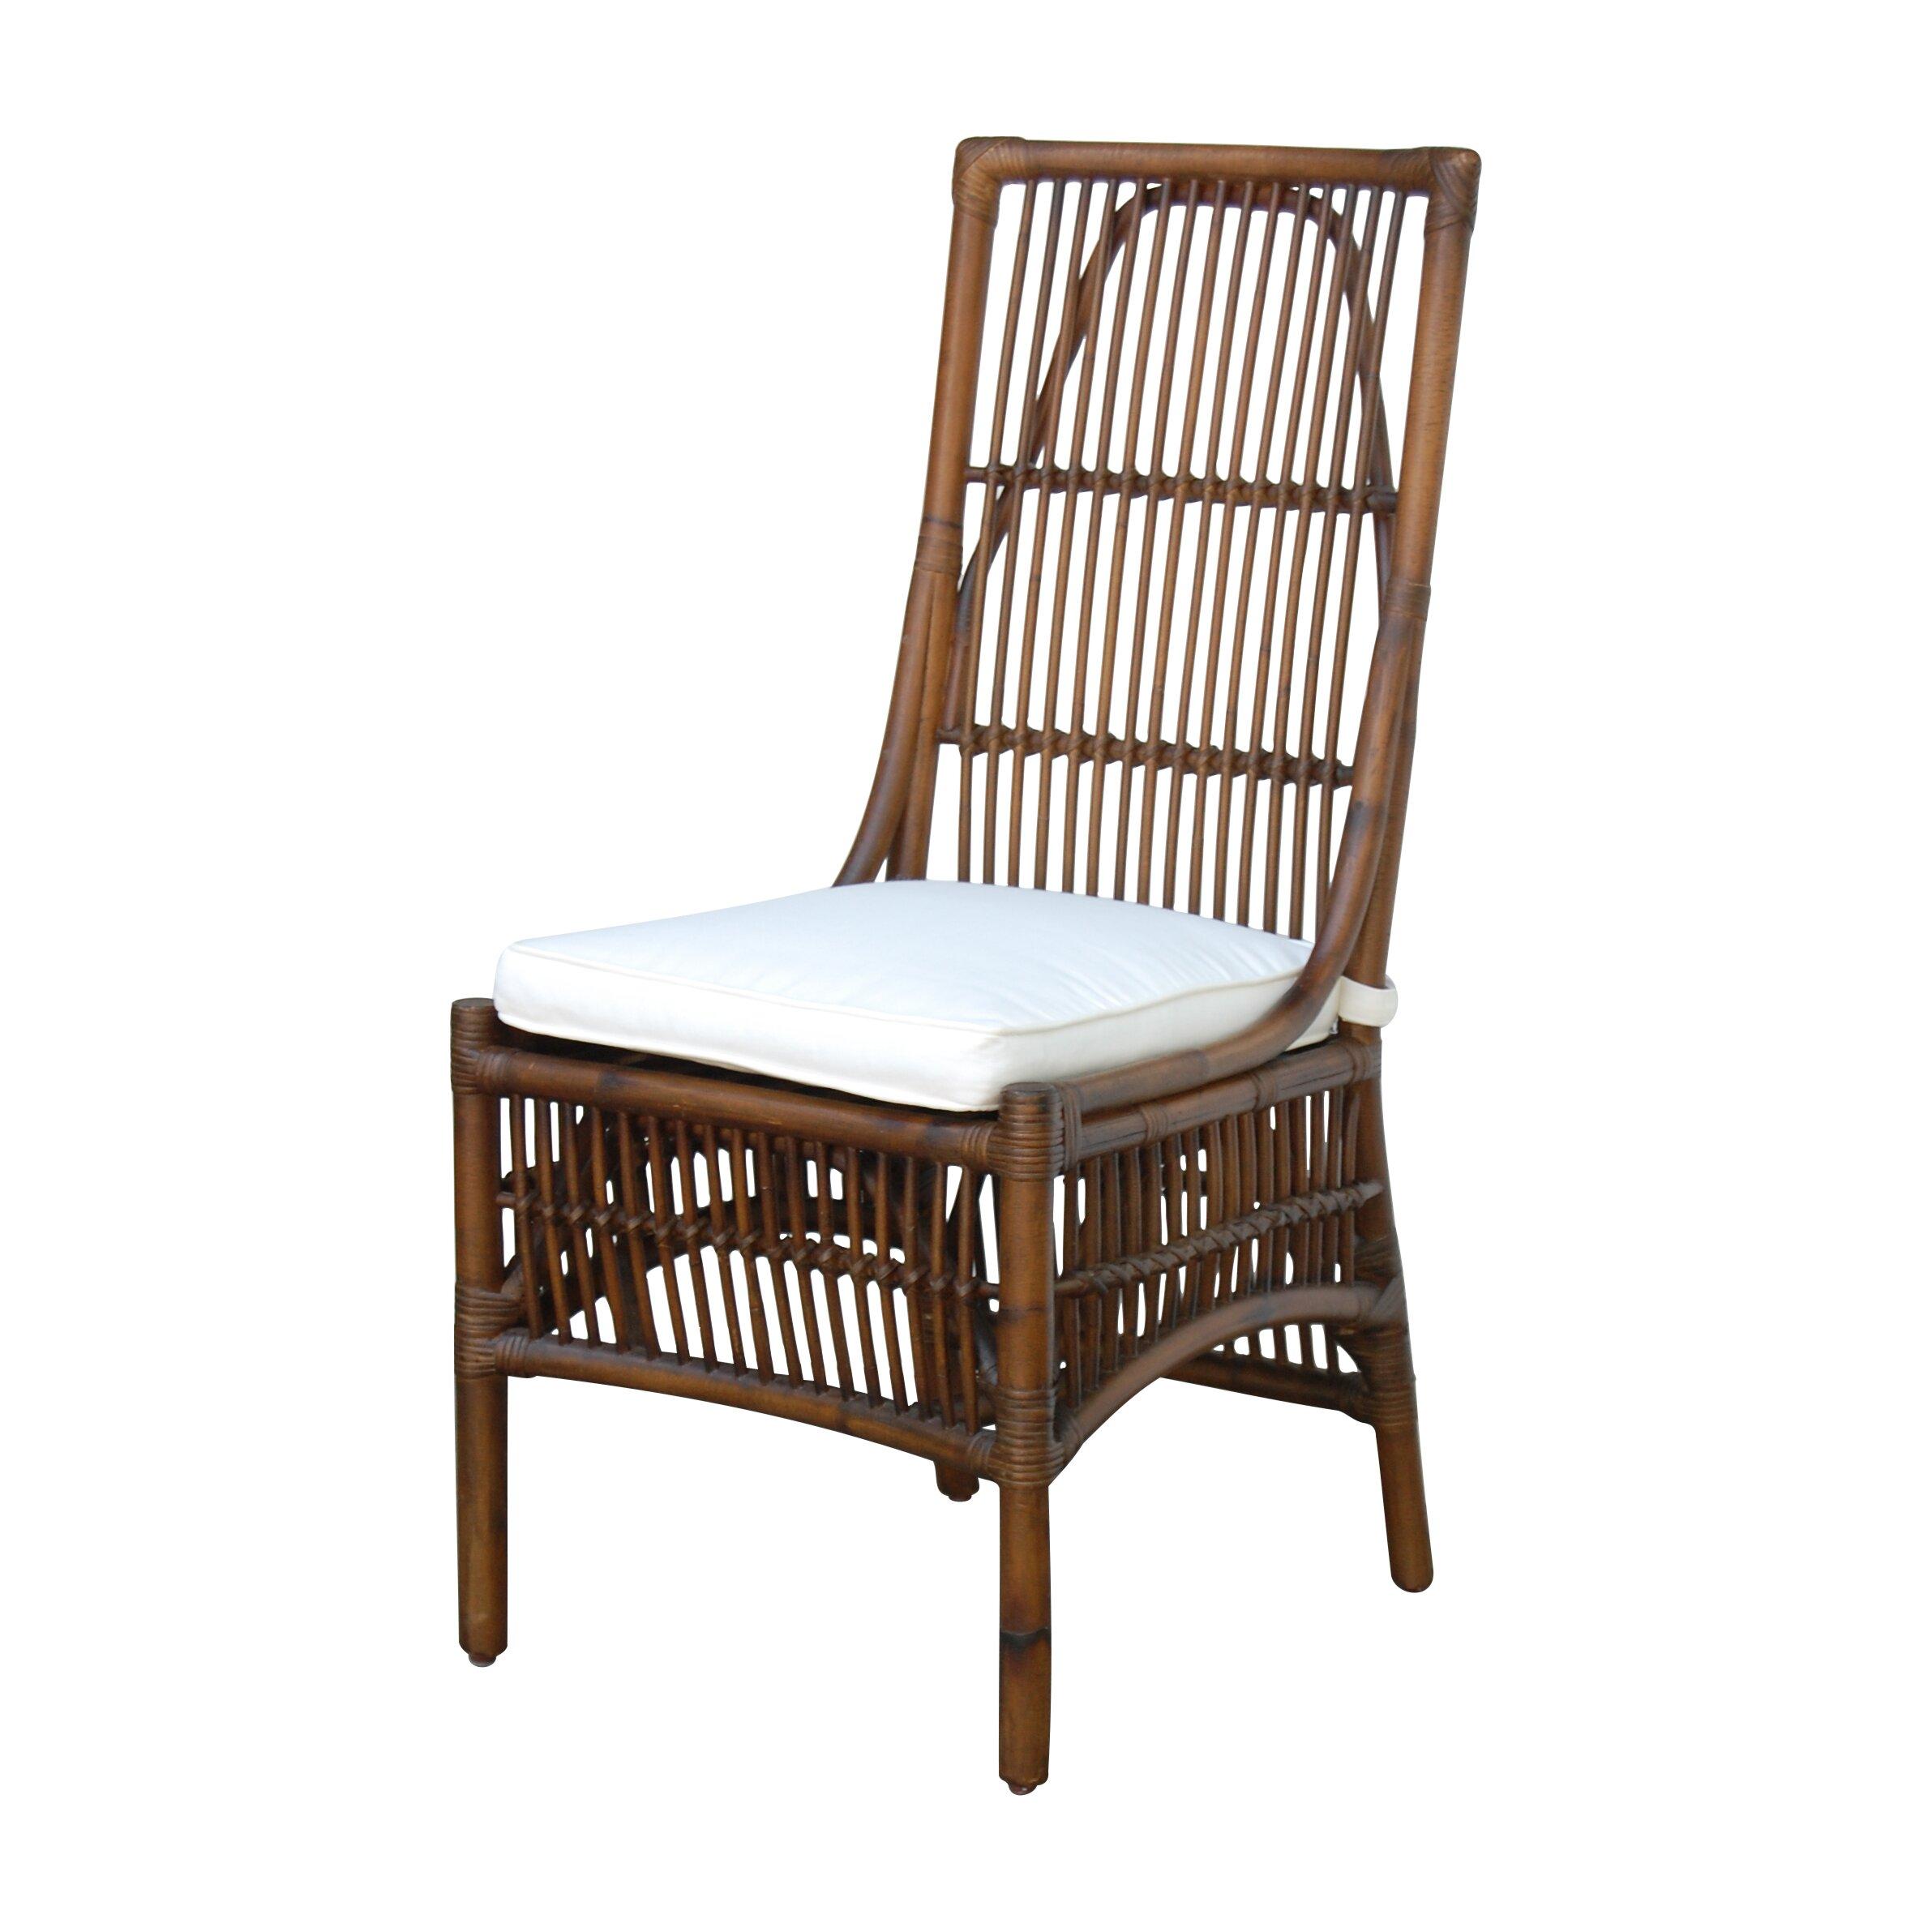 Panama Jack Bora Bora Side Chair with Cushion amp Reviews  : Panama Jack Home Bora Bora Side Chair with Cushion from www.wayfair.com size 2383 x 2383 jpeg 442kB